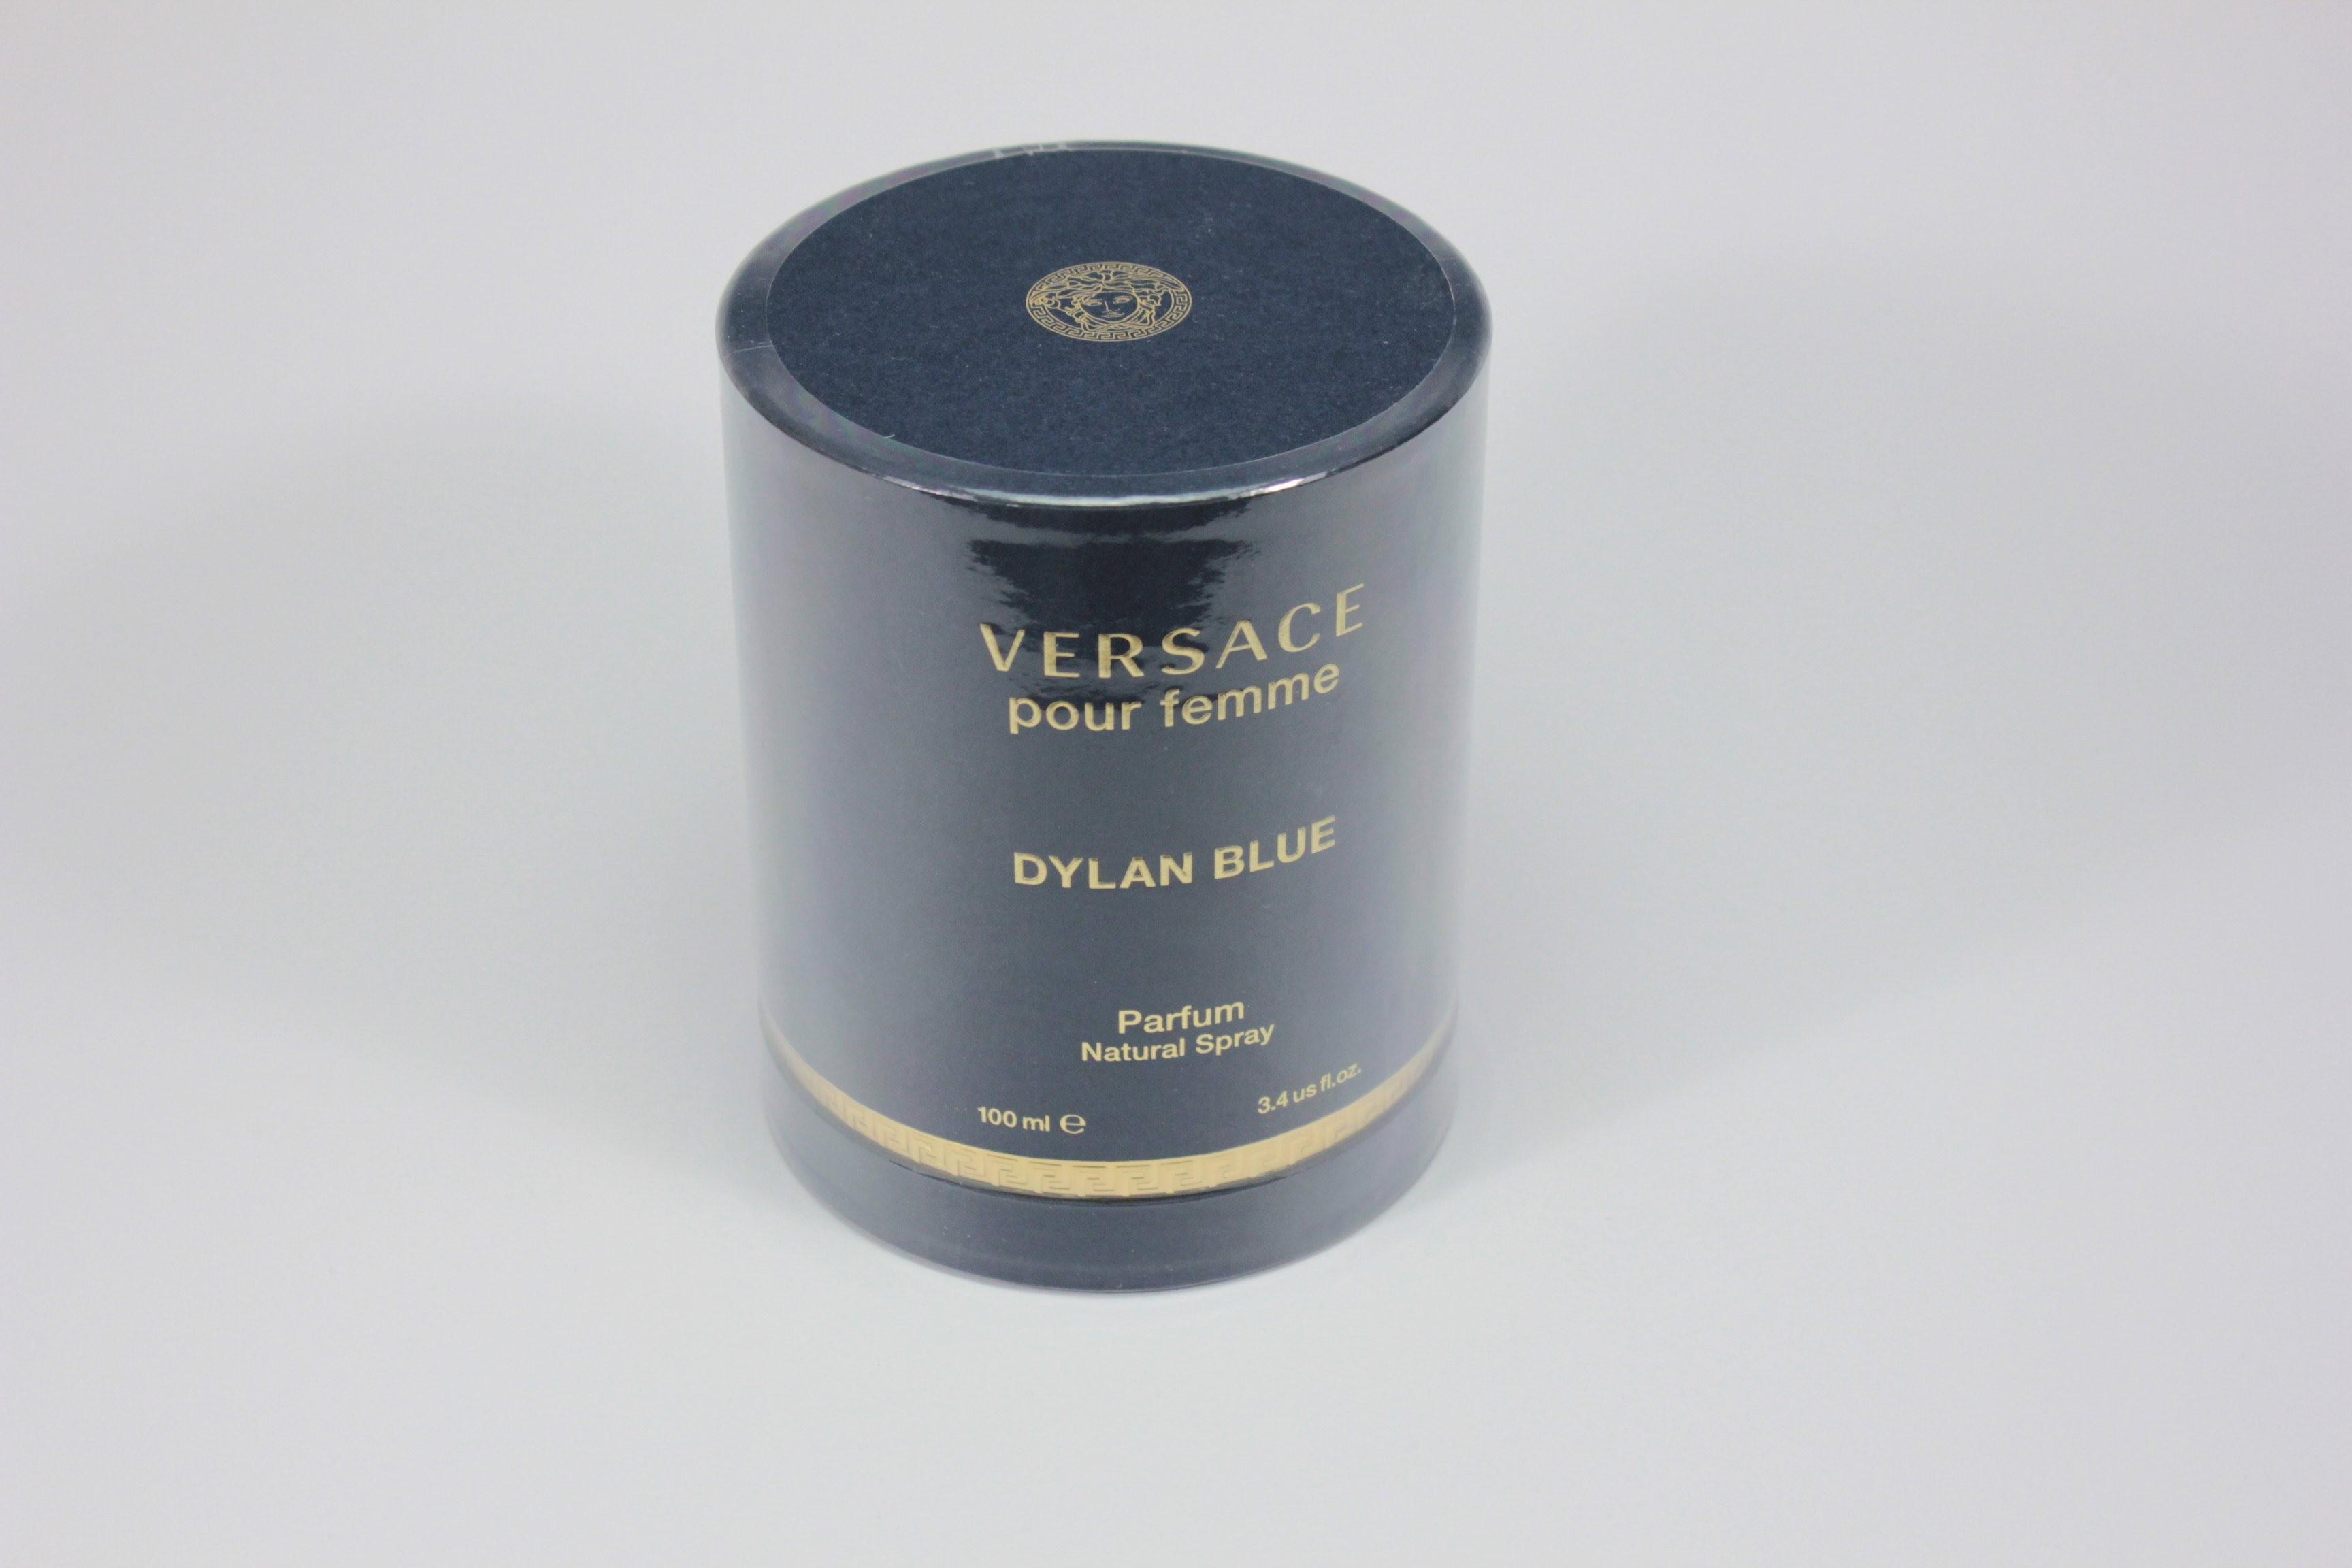 Versace Pour Femme Dylan Blue Parfum Perfume Women 100ml Spray